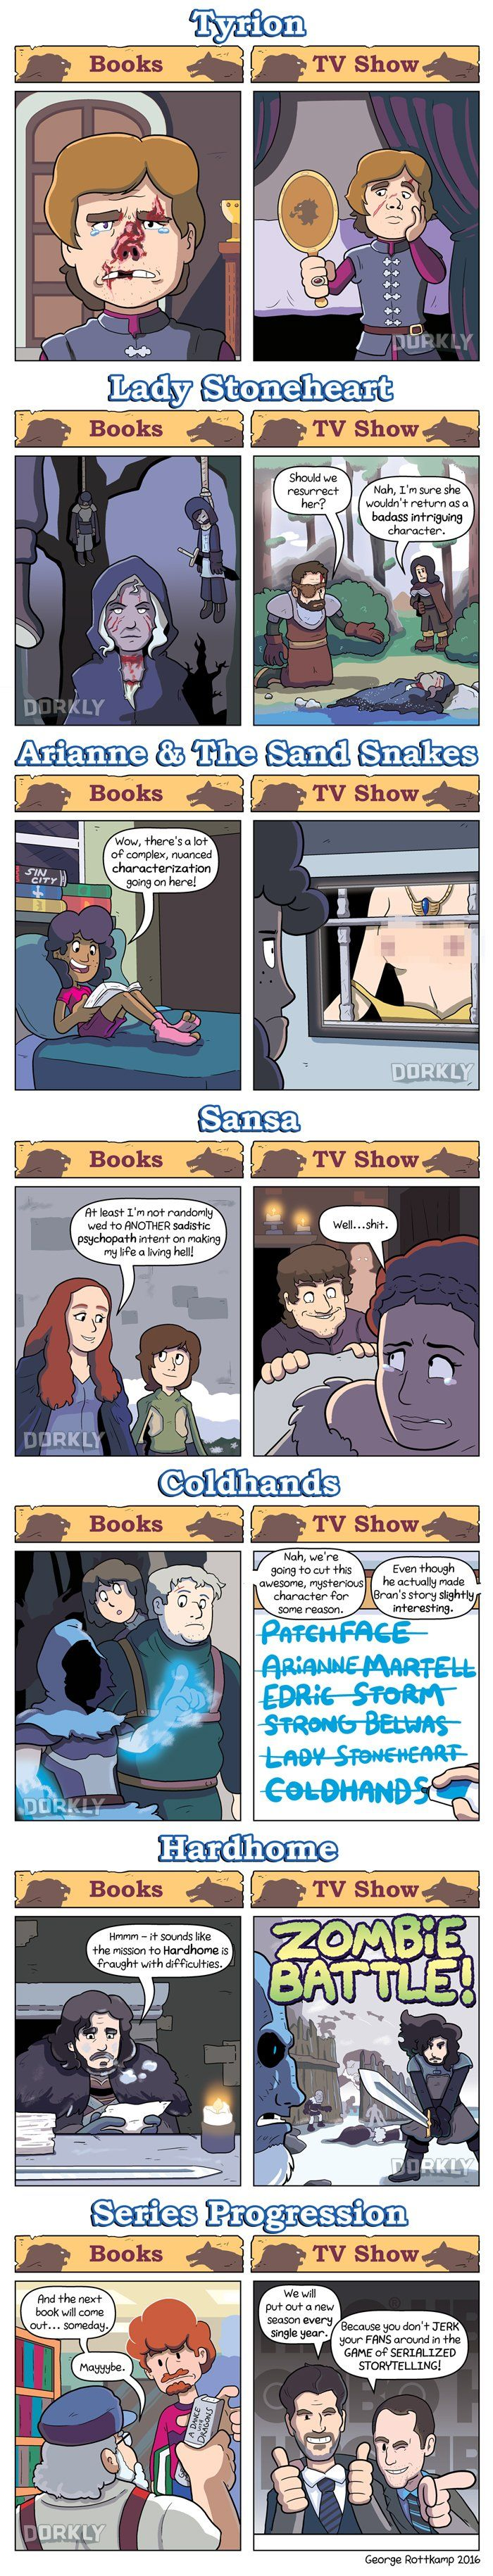 Google chrome themes game of thrones - Game Of Thrones Books Vs Show Comic Full